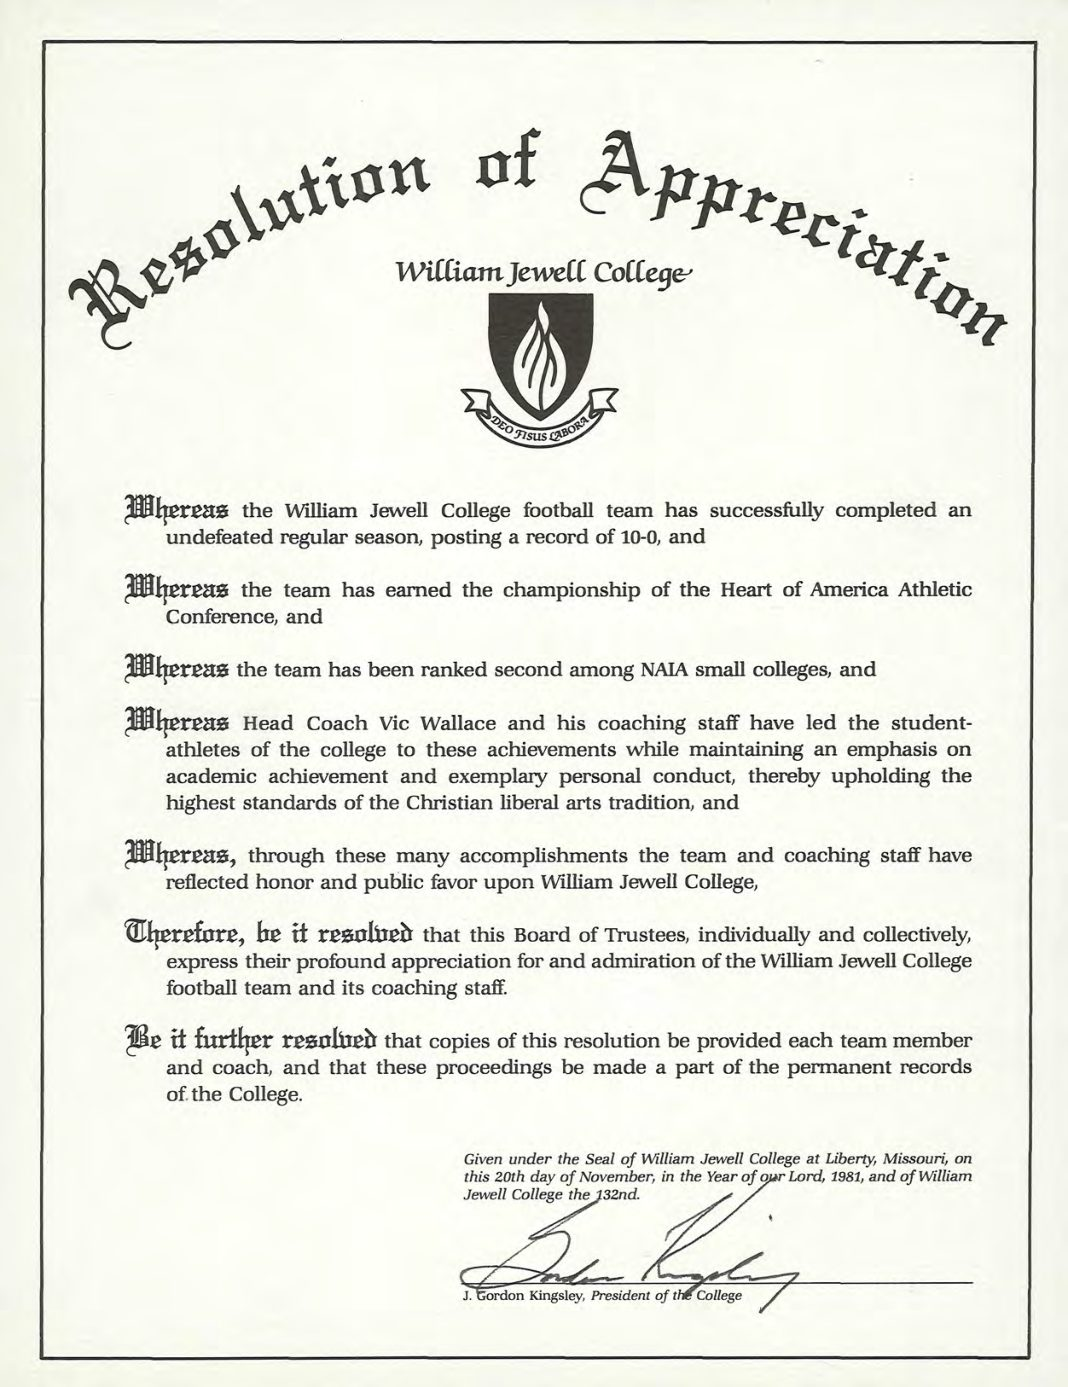 1981 Resolution of Appreciation